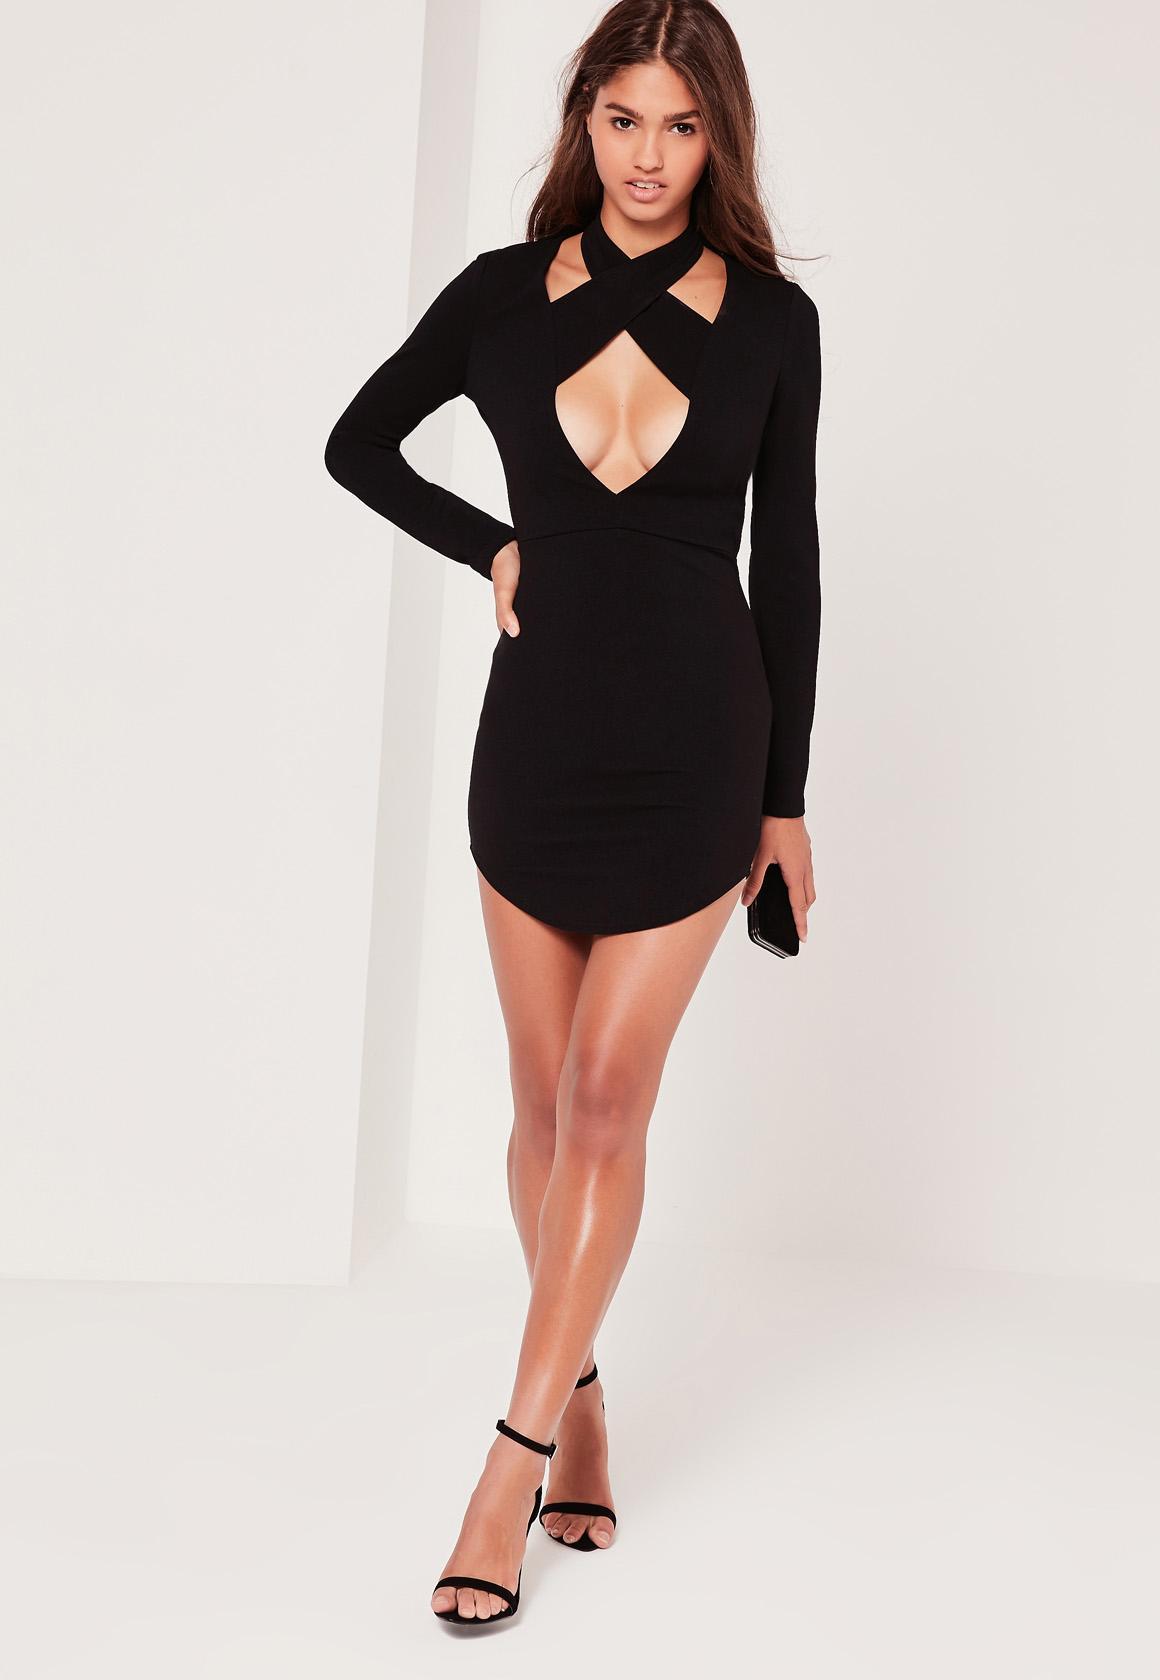 Black dress halter neck - Halterneck Plunge Curve Hem Bodycon Dress Black Previous Next